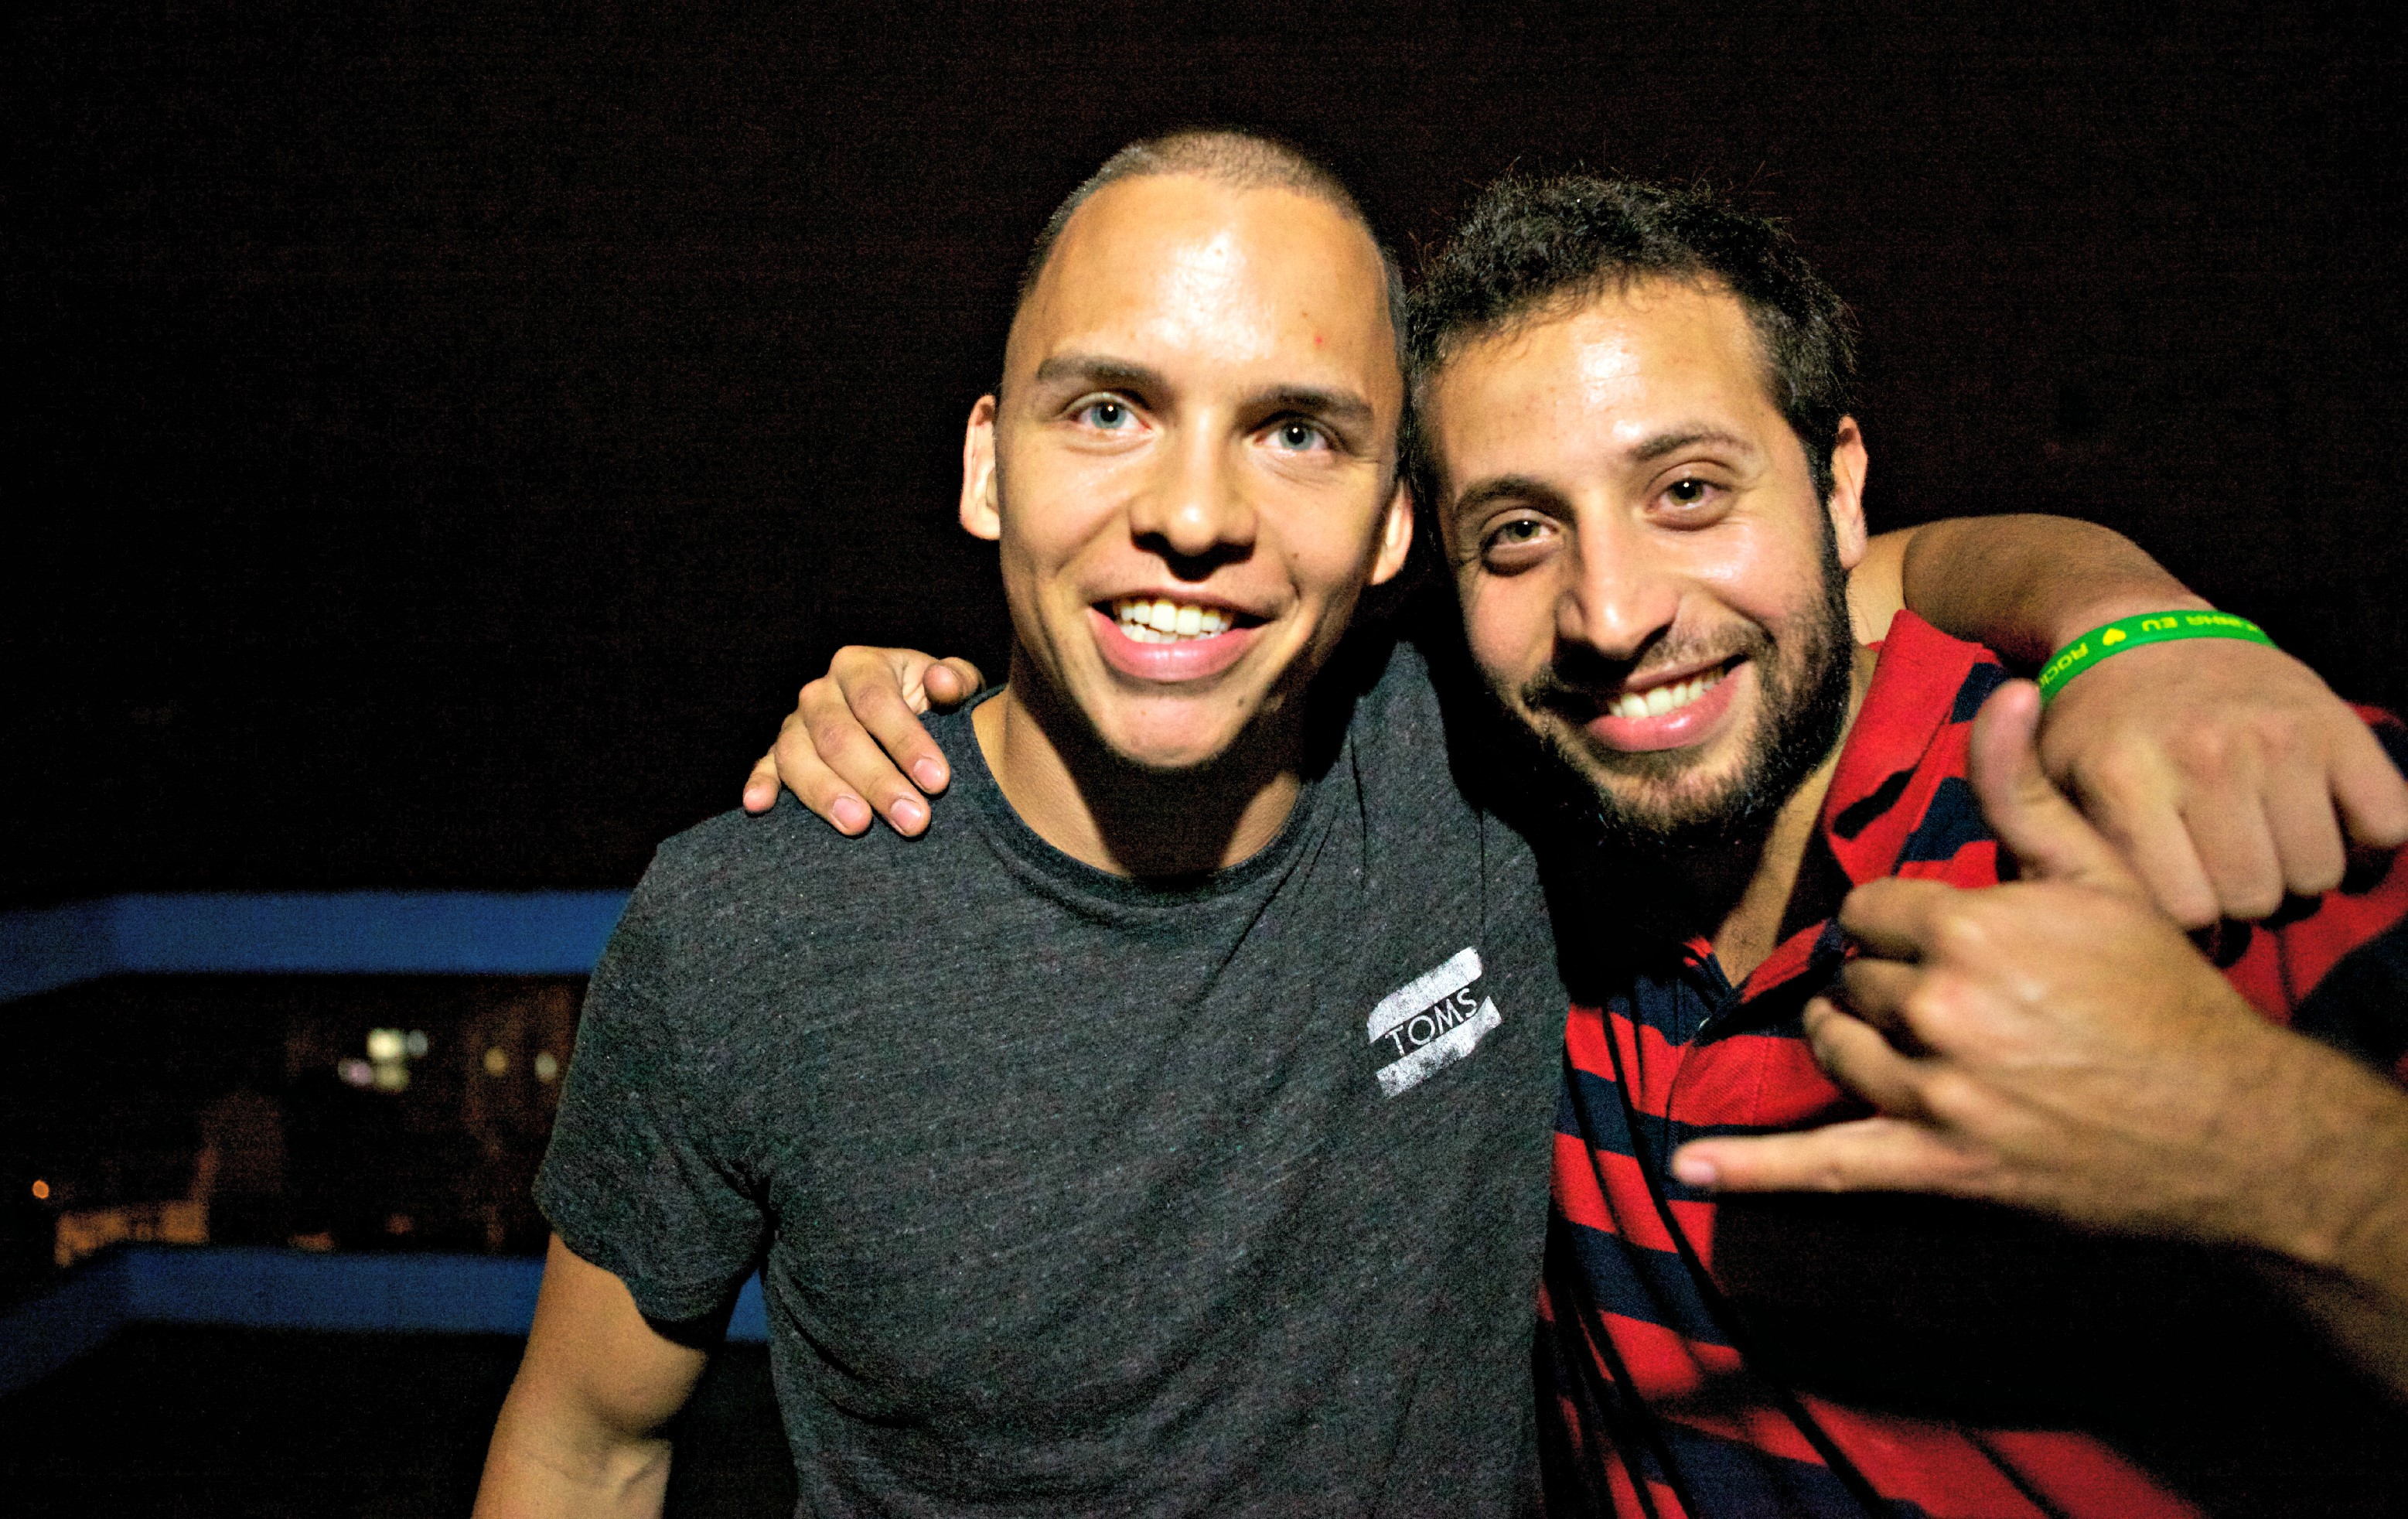 Adam Newman and Rodrigo Viera, the founders of FAVEX